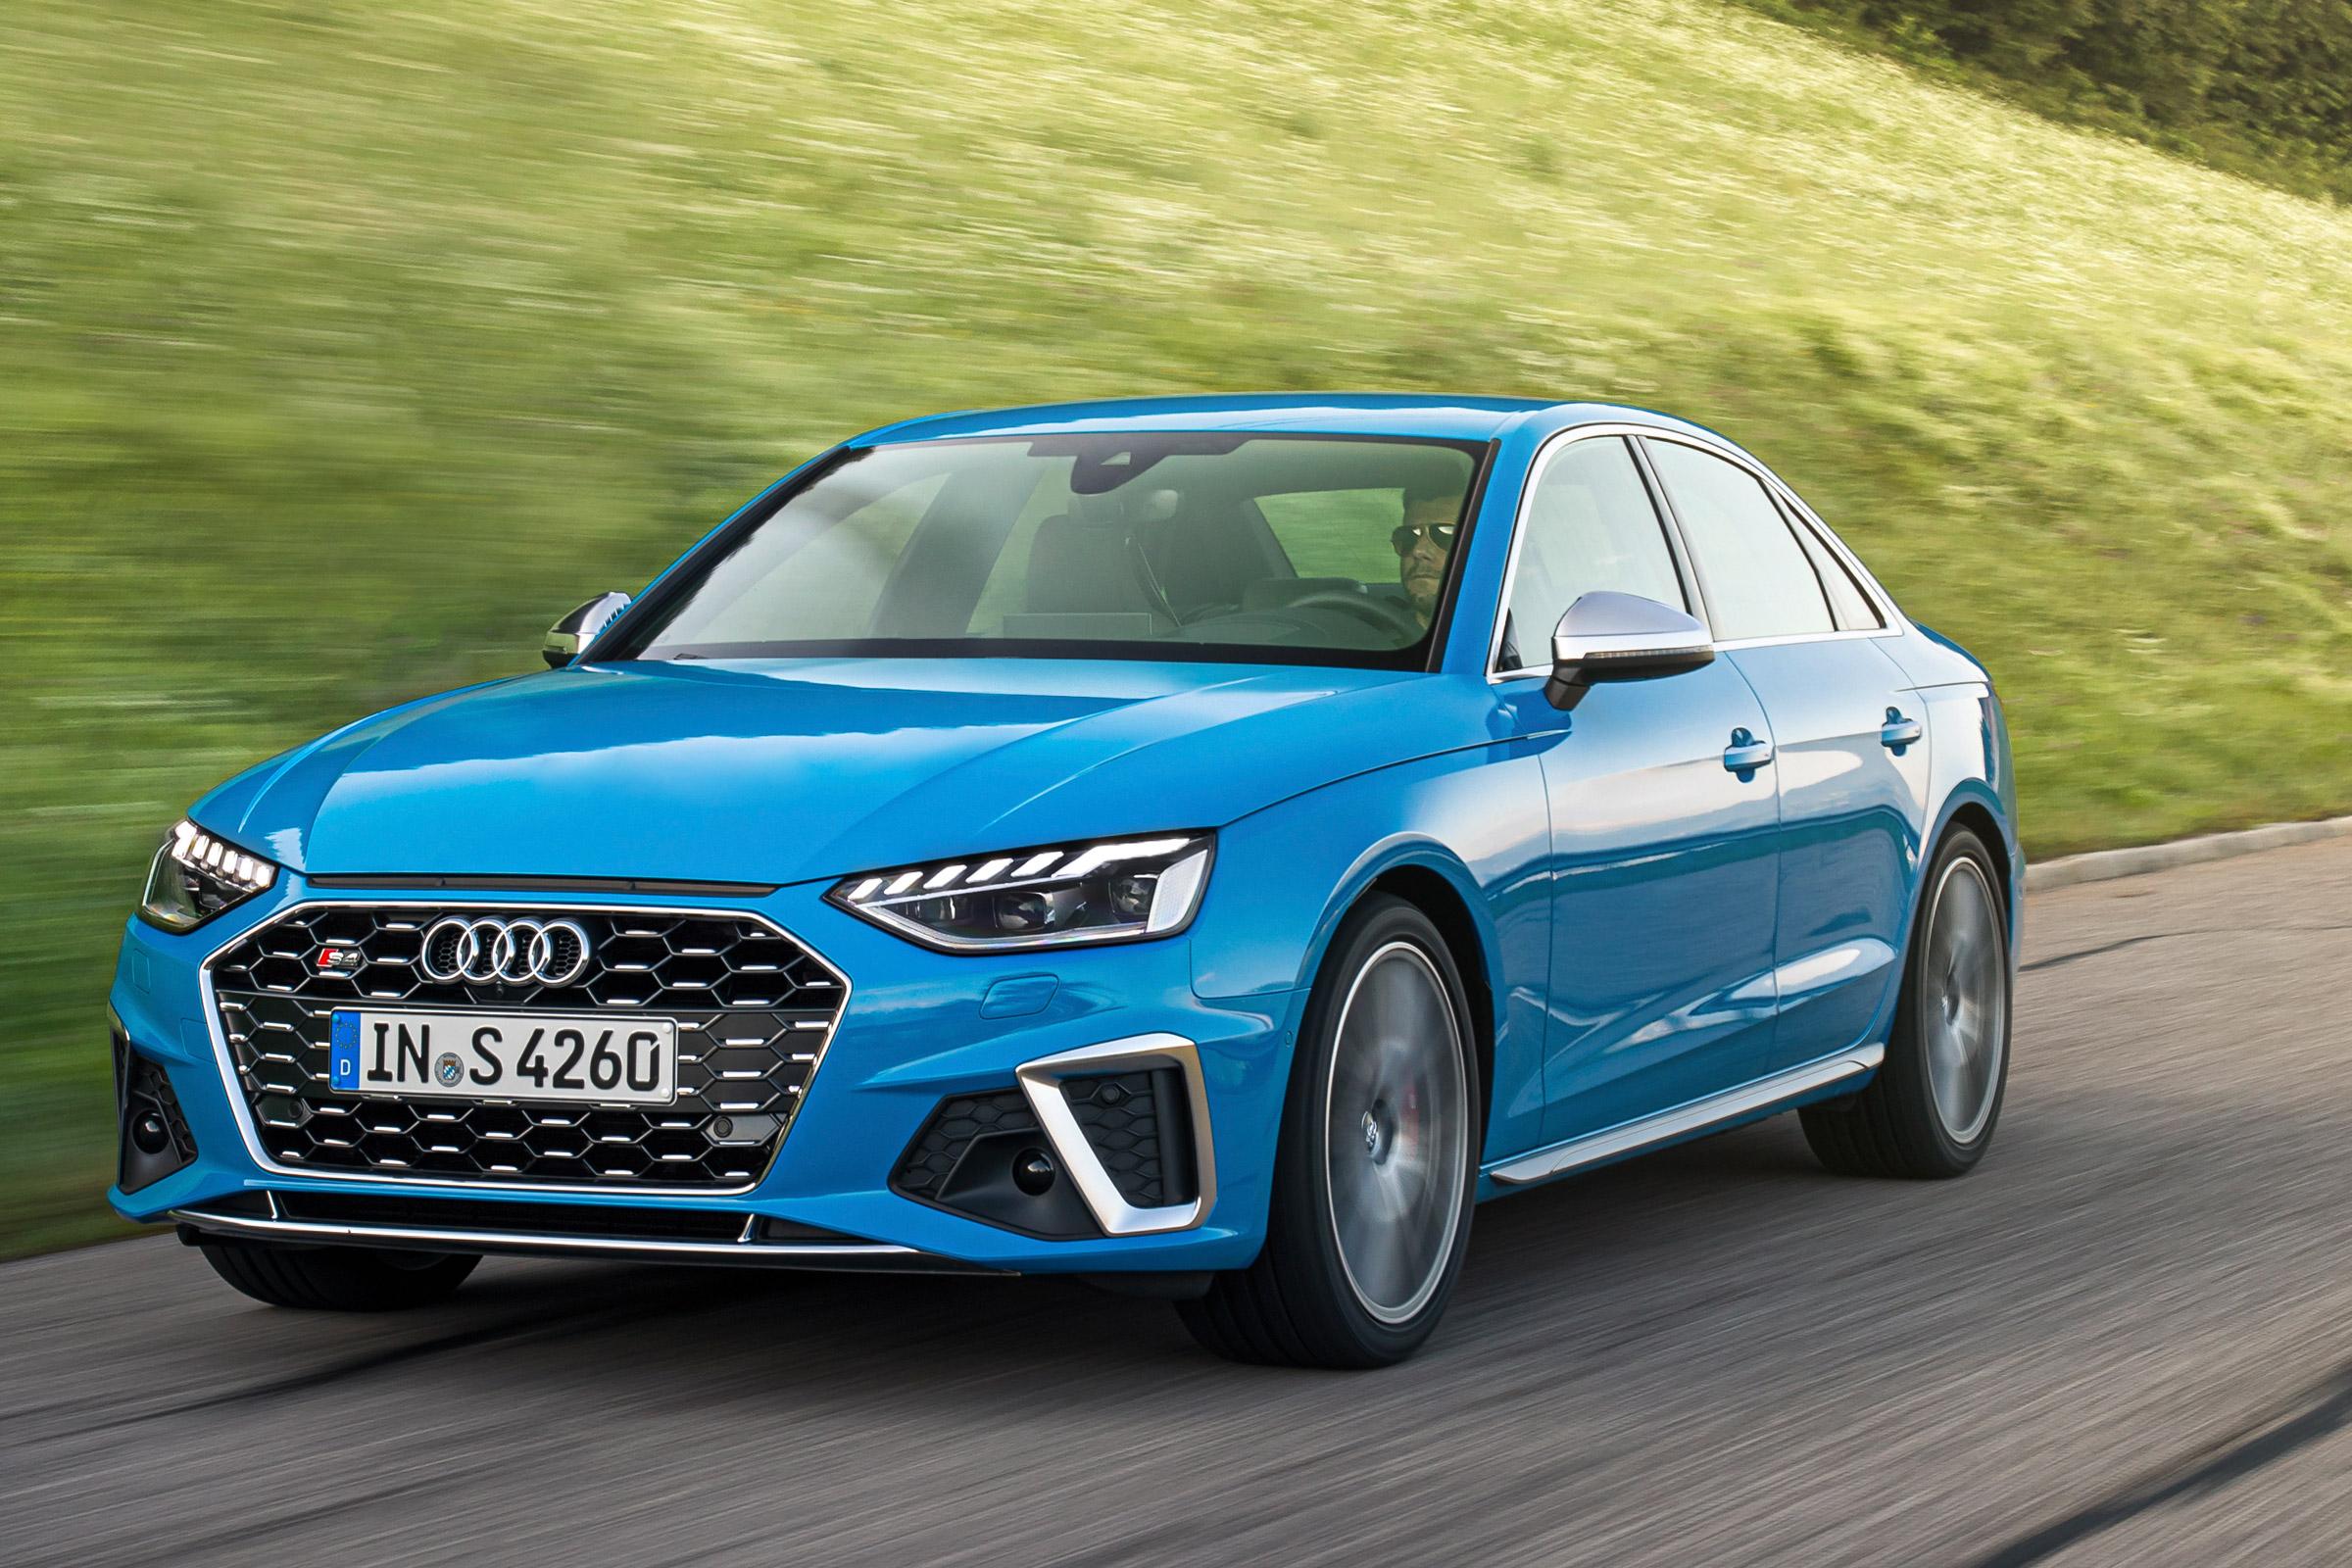 Kekurangan Audi S4 2019 Spesifikasi